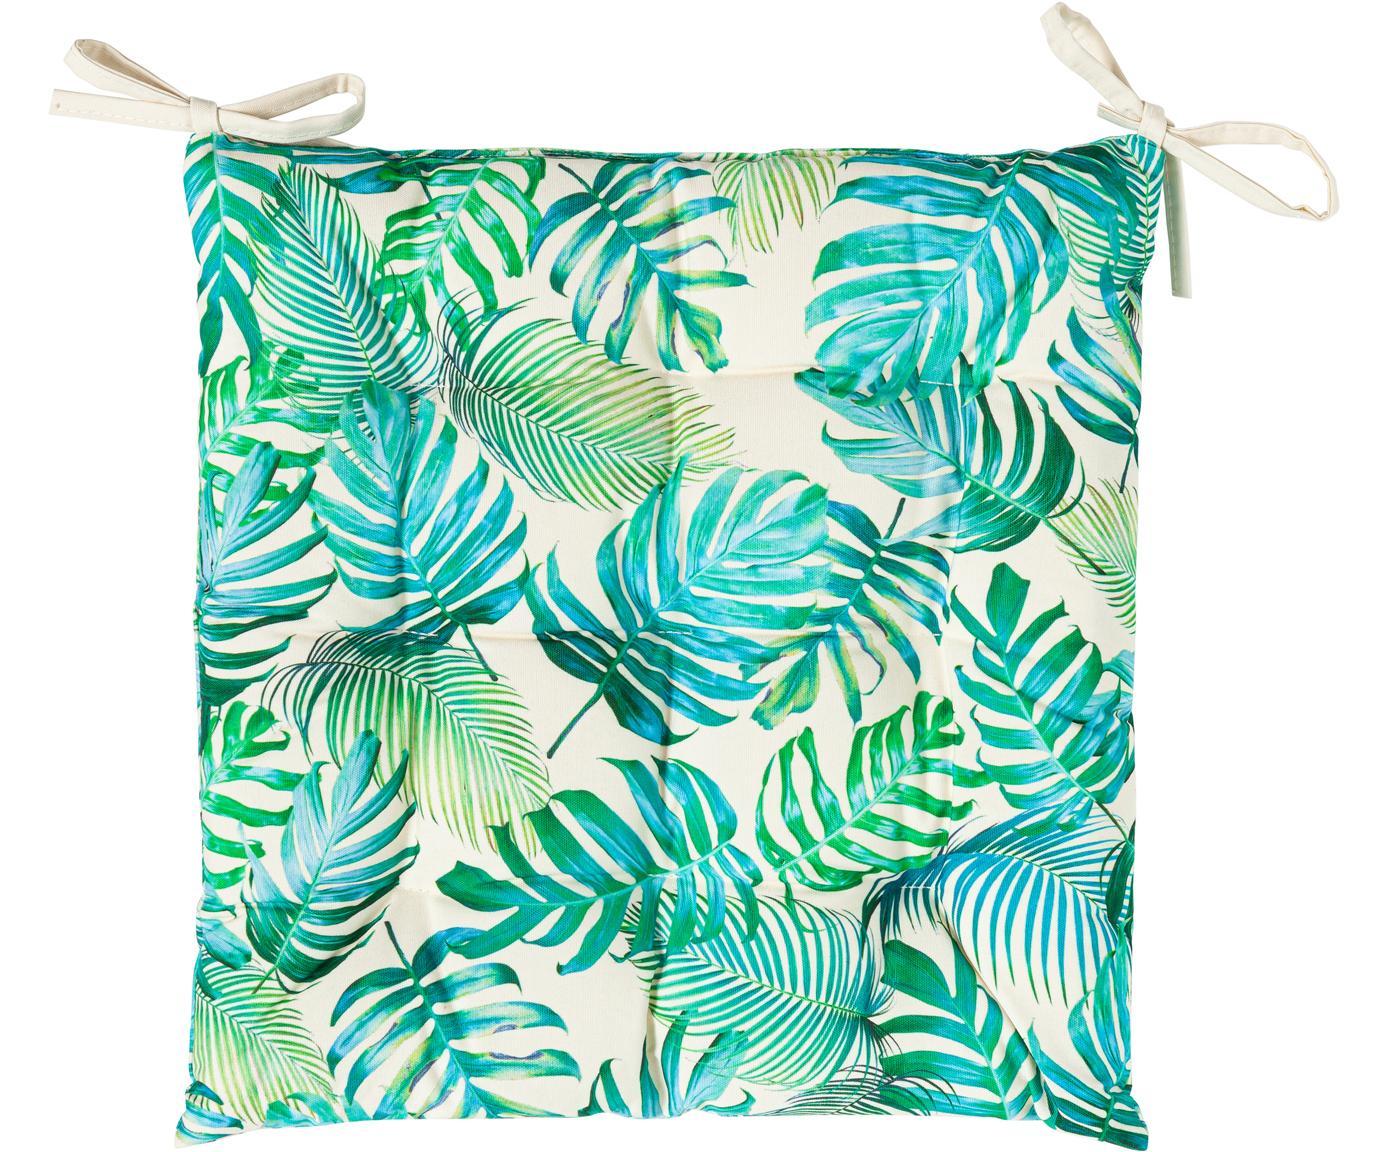 Outdoor stoelkussen Madeira  , Polyester, Gebroken wit, blauwtinten, groentinten, 40 x 40 cm